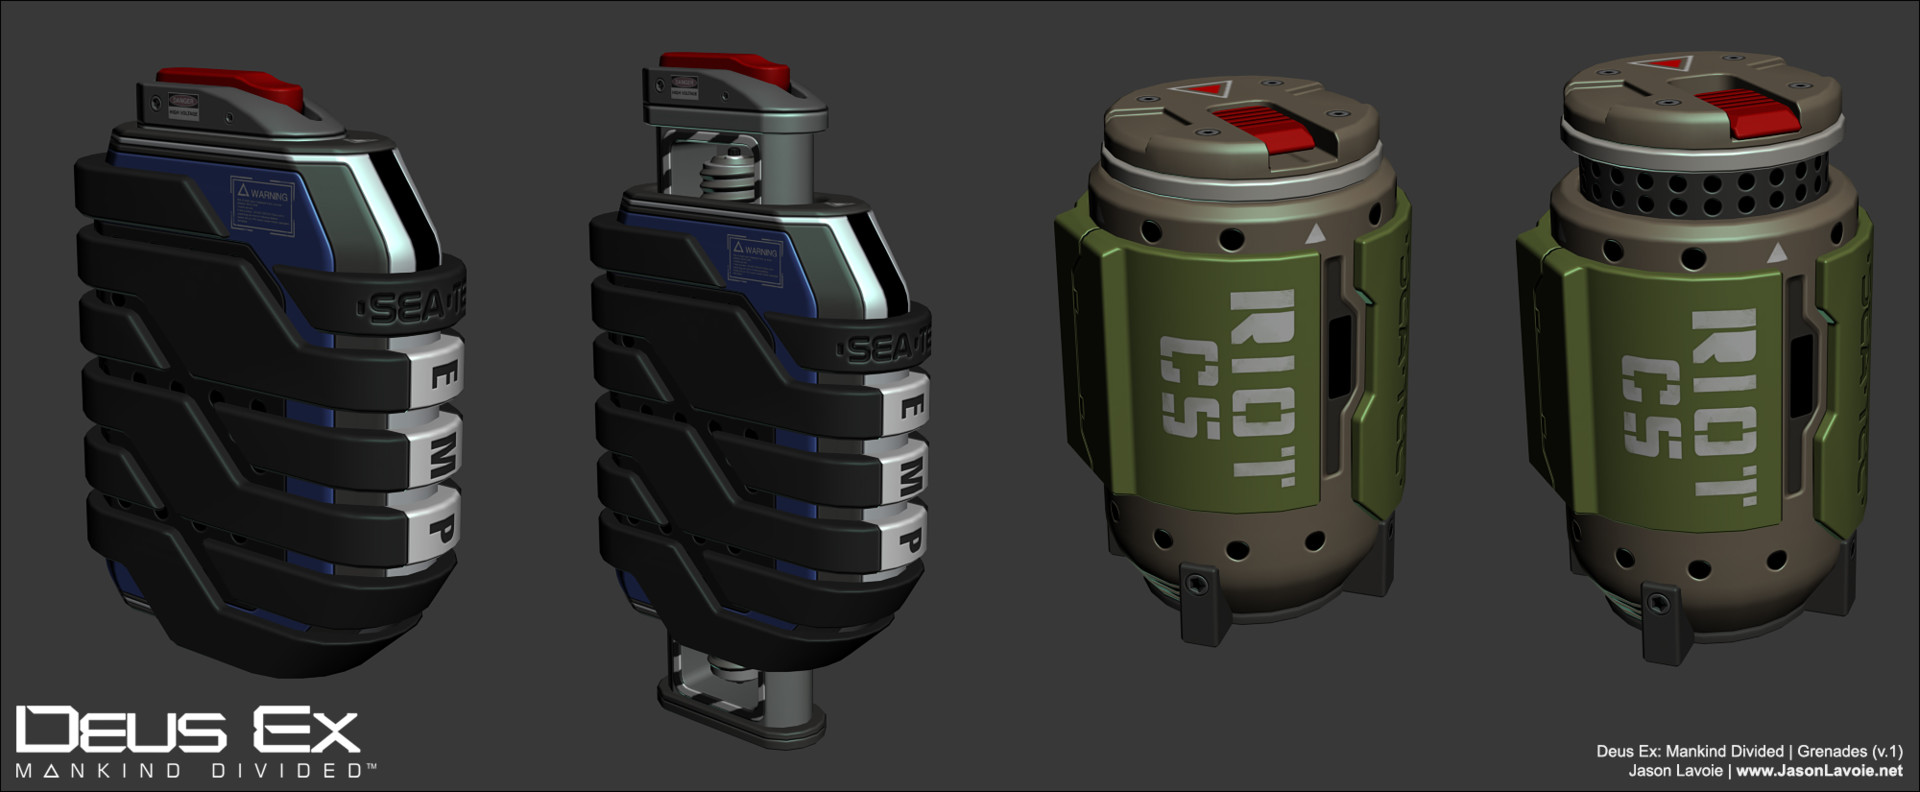 Jason lavoie jasonlavoie grenades 01